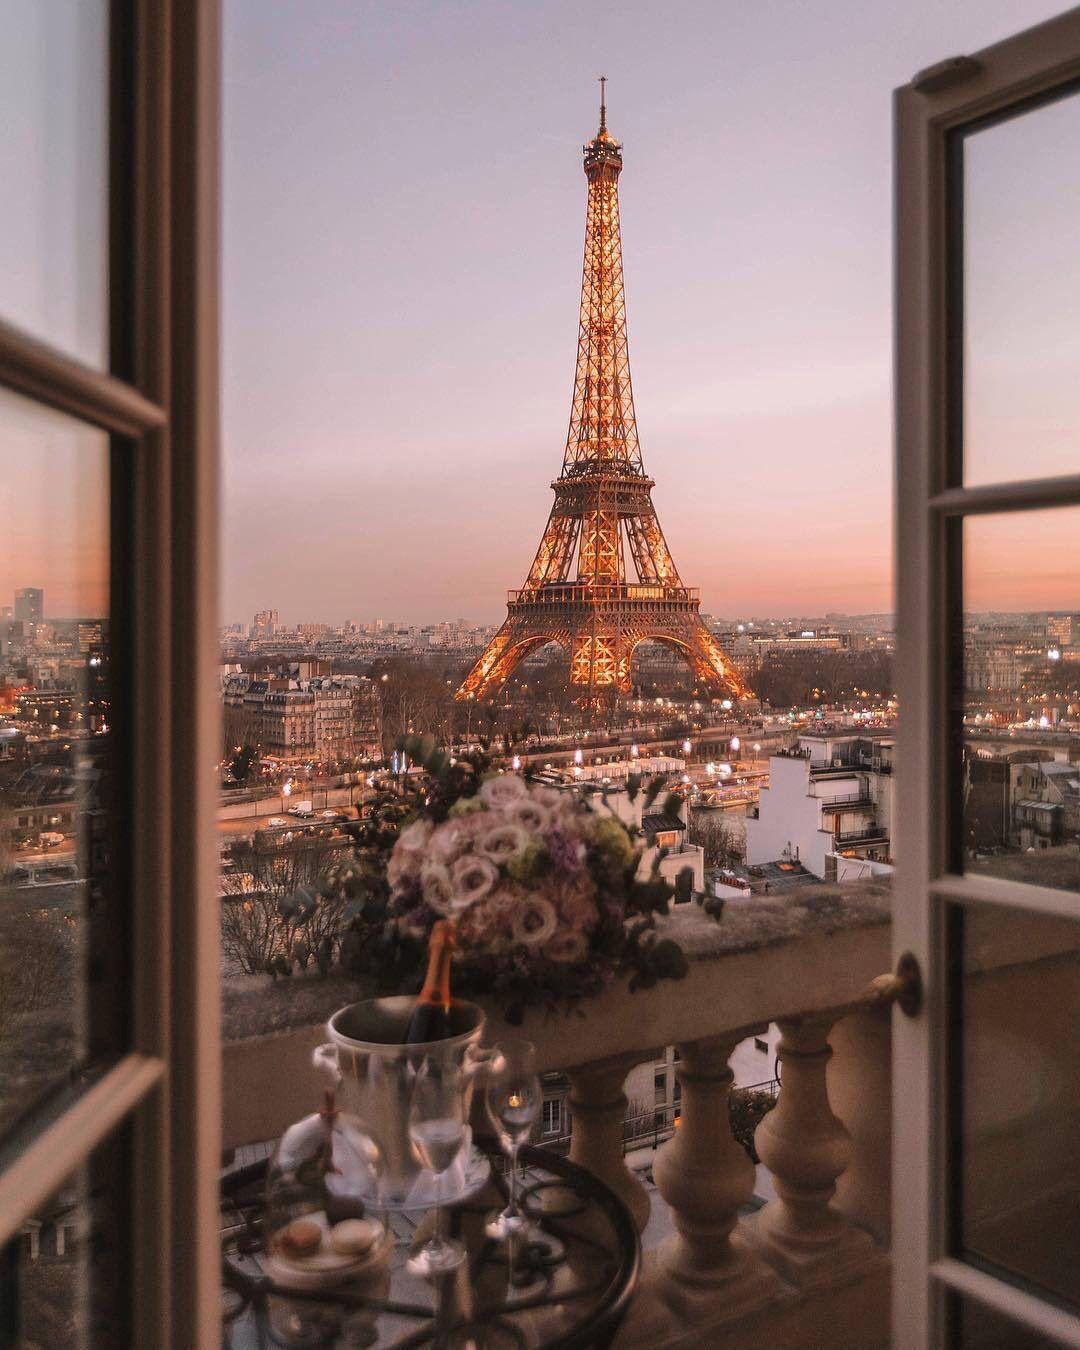 Pin By 167 On Views Paris Wallpaper Travel Aesthetic Paris